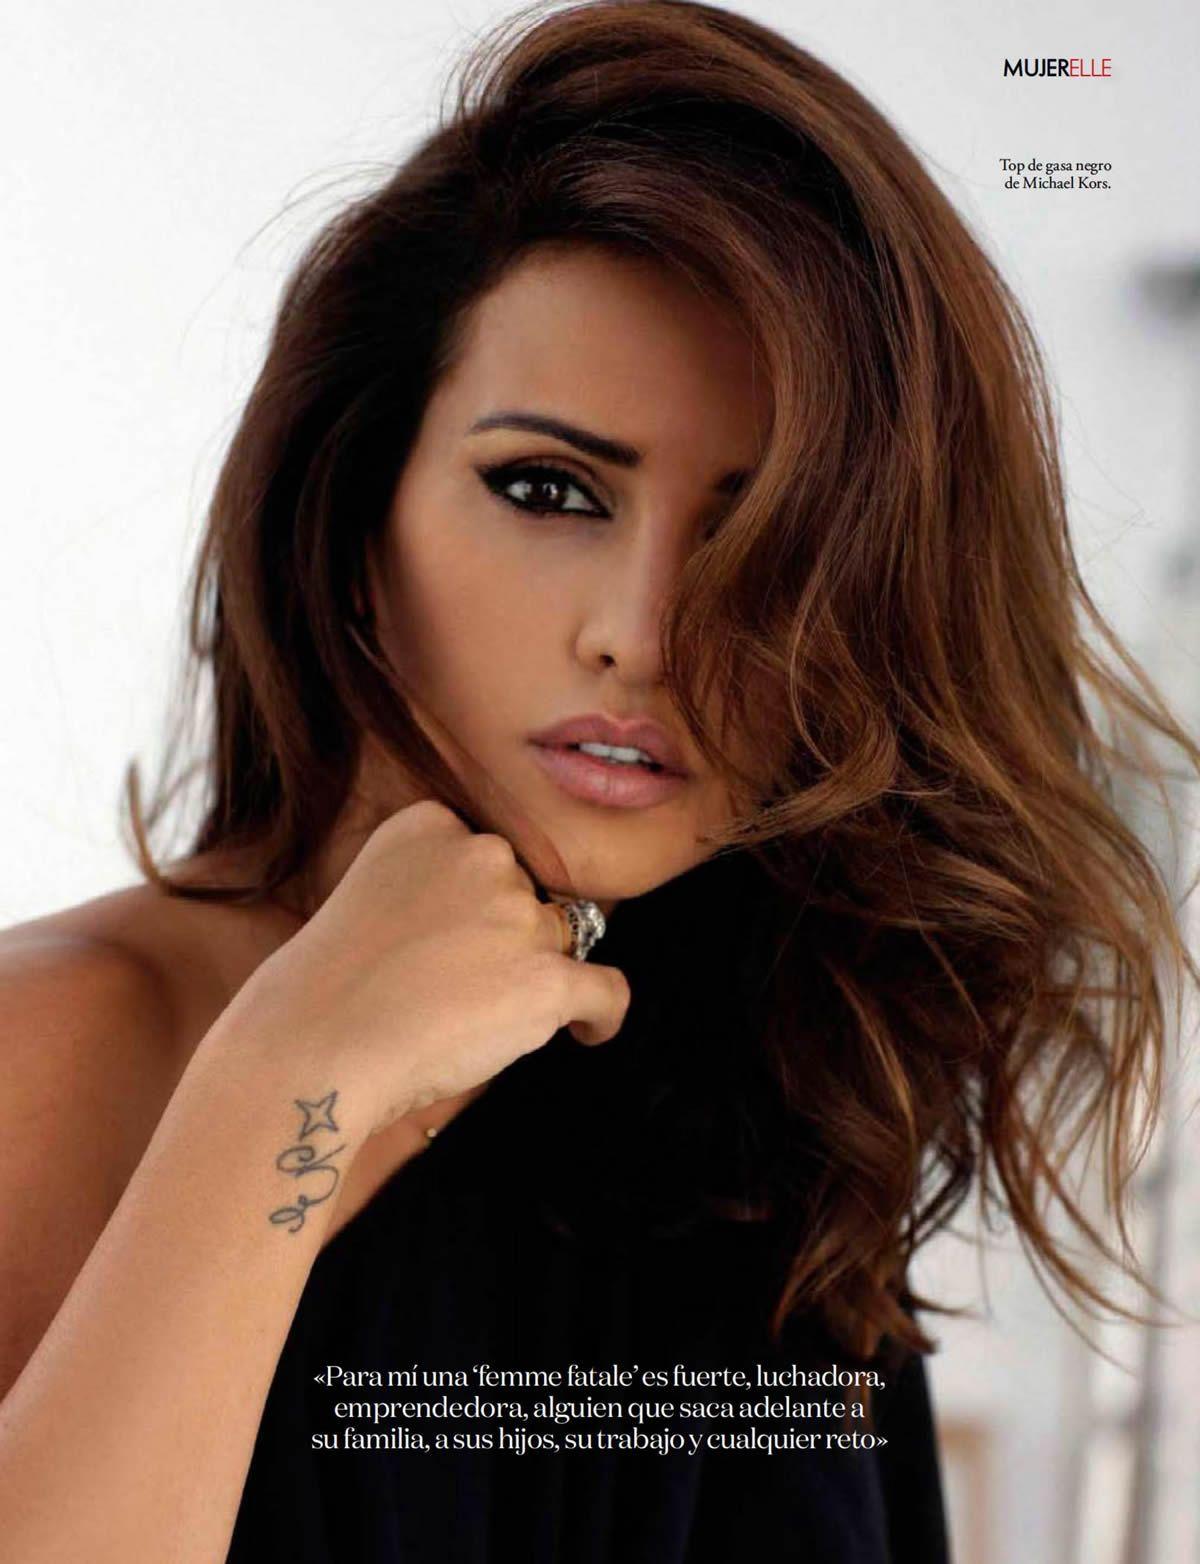 ☆ Monica Cruz | Photography by Bernardo Doral | For Elle Magazine Spain | November 2014 ☆ #Monica_Cruz #Bernardo_Doral #Elle #2014